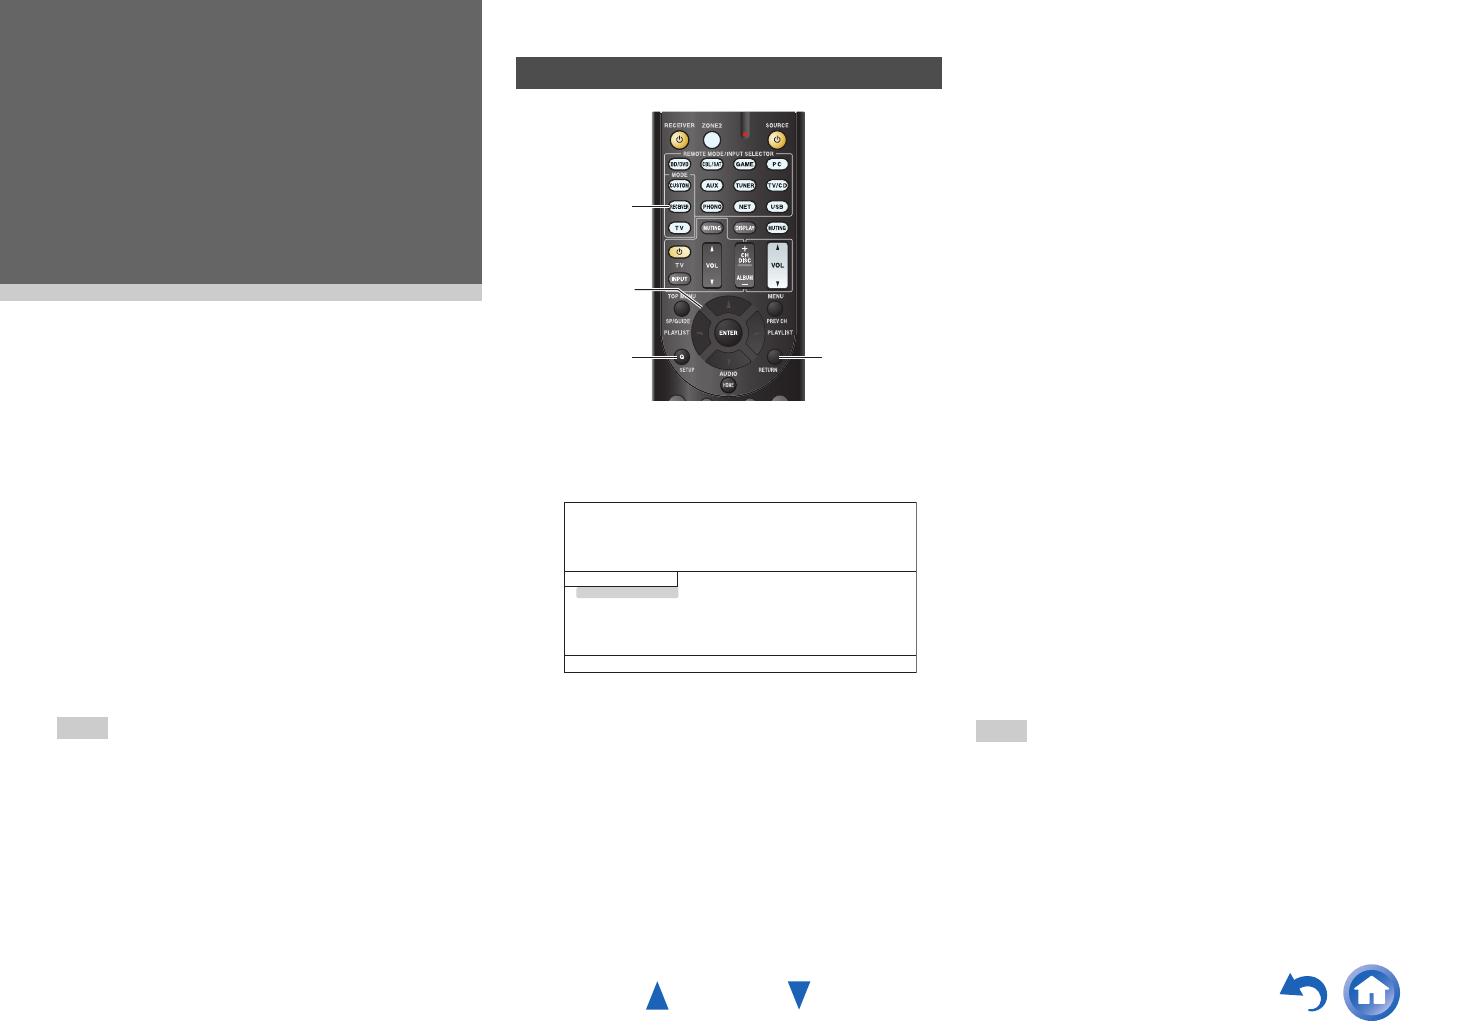 Onkyo TX-NR626 On-screen Setup, Advanced Operations